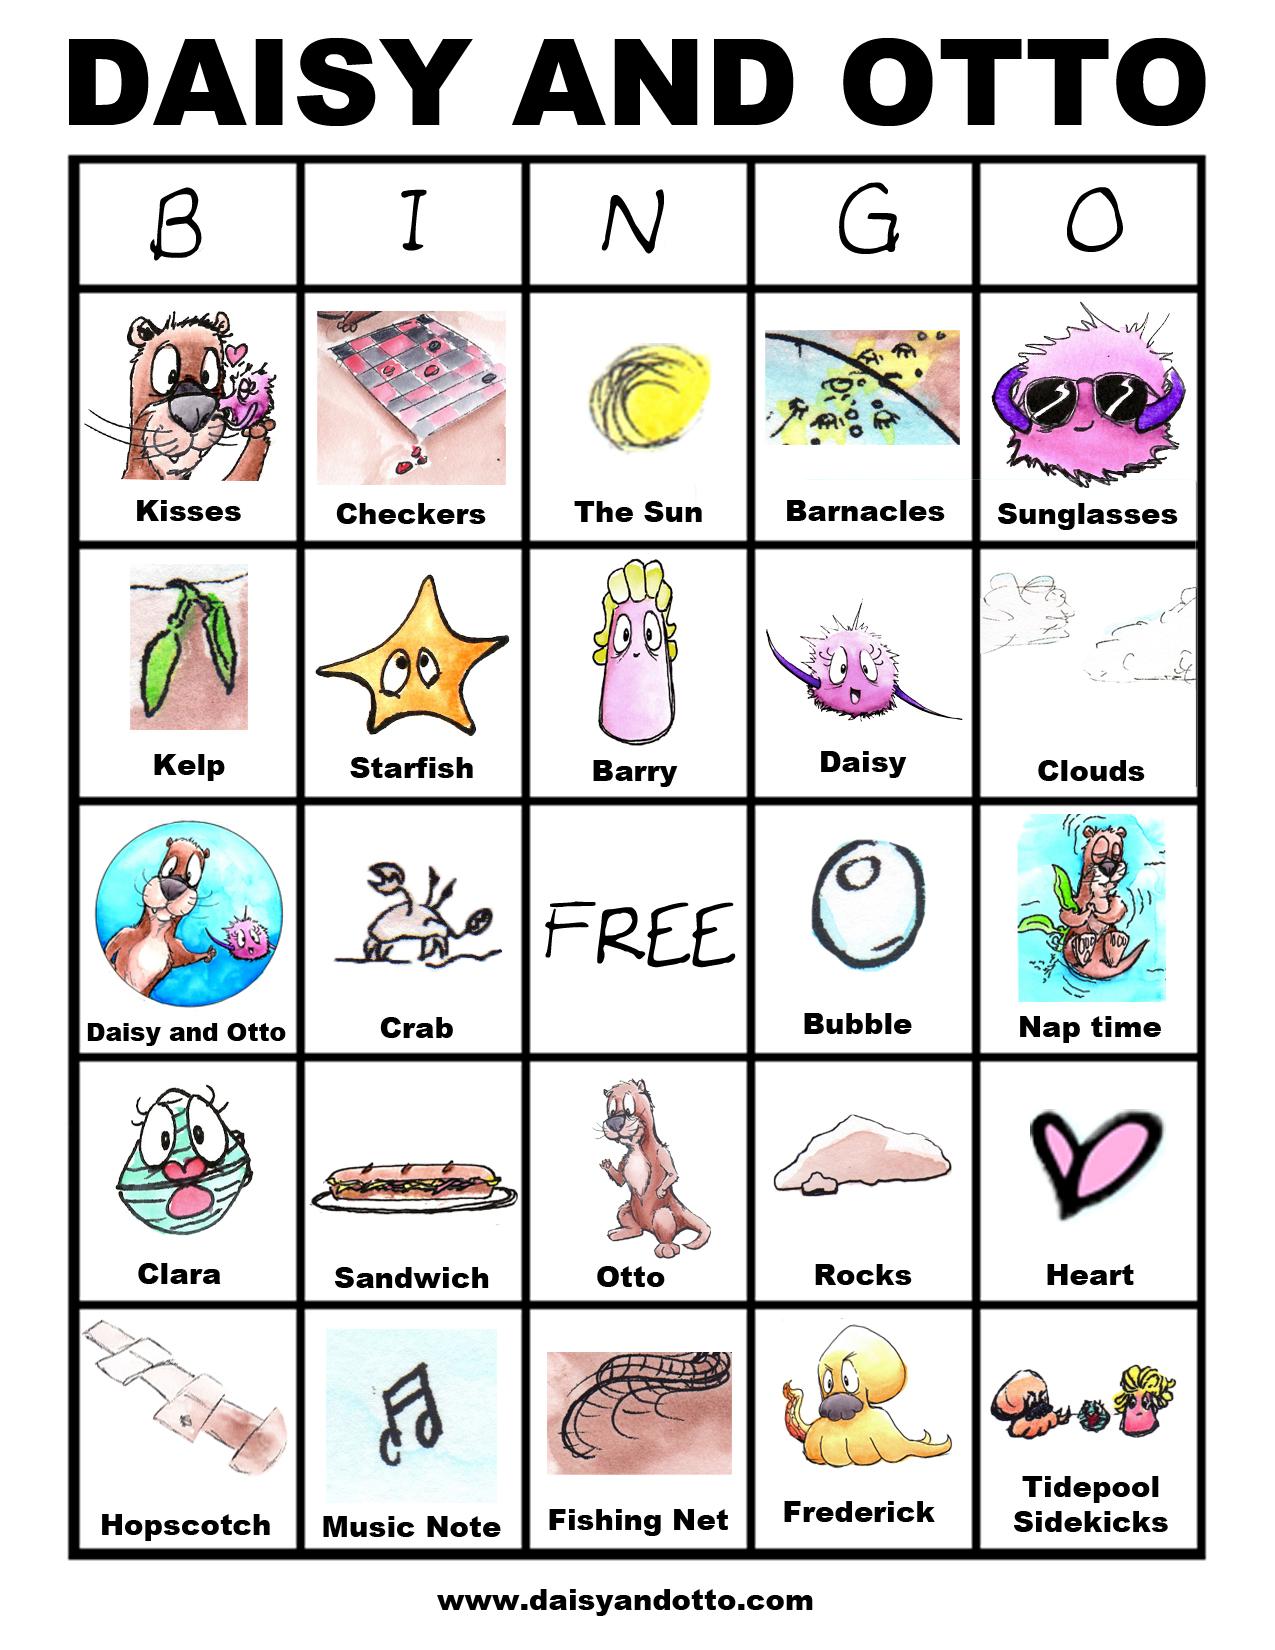 Daisy and Otto Free Bingo Game Printable